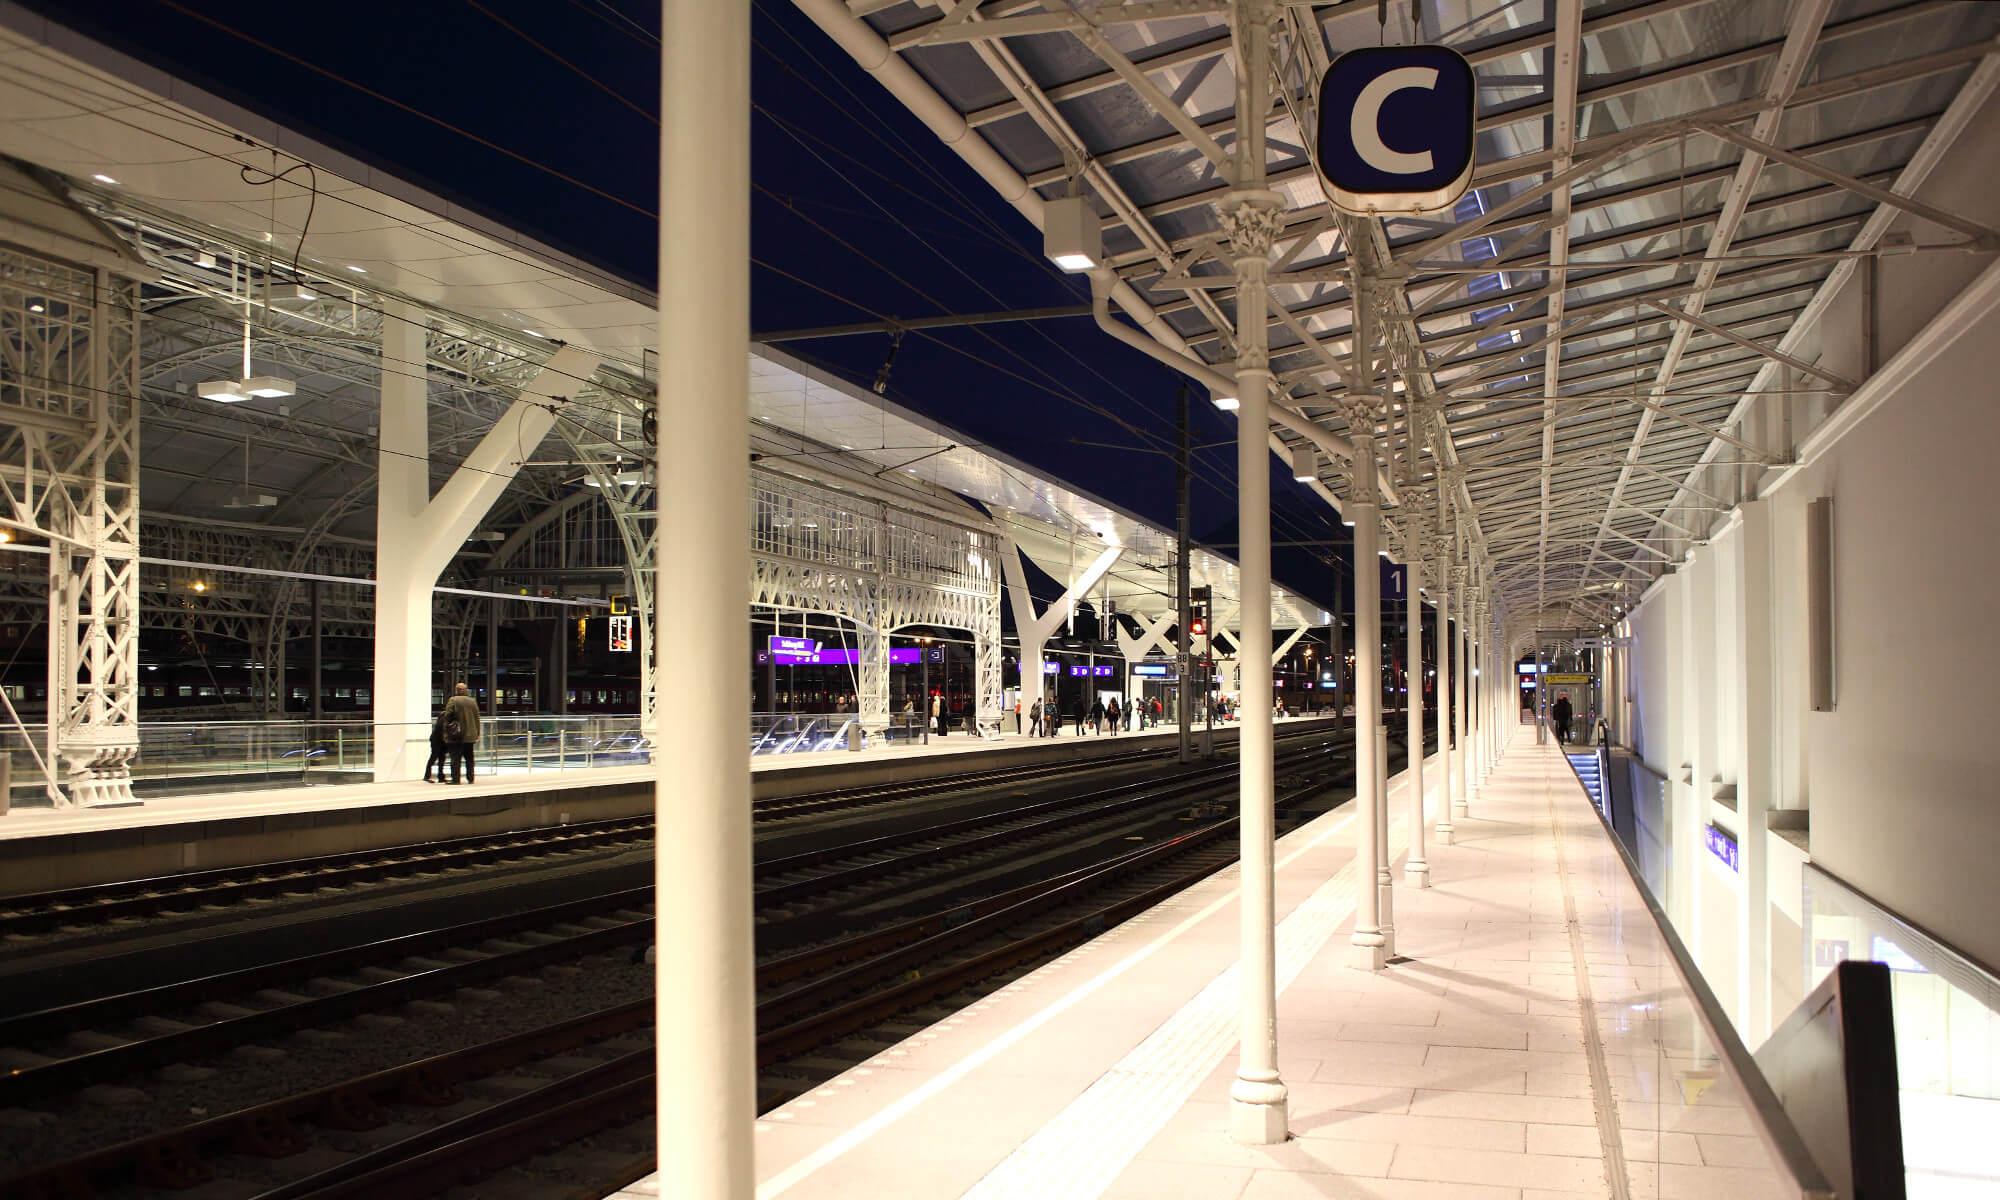 Beleuchtungslösung Referenz Deutsche Bahn Bahnsteig